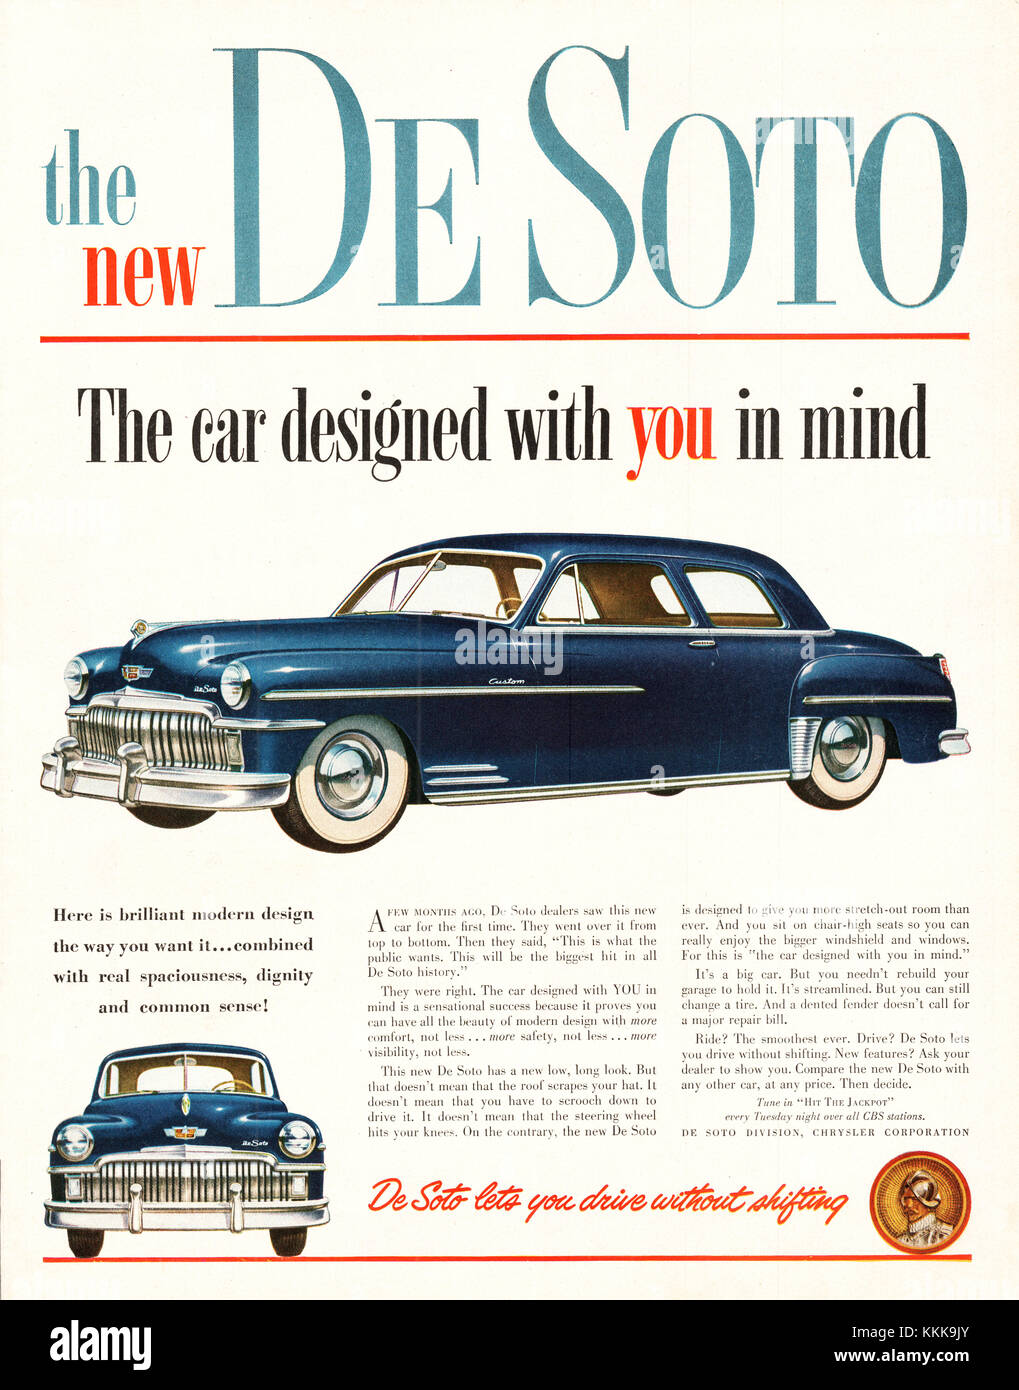 1949 U.S. Magazine Ford De Soto Car Advert Stock Photo, Royalty ...